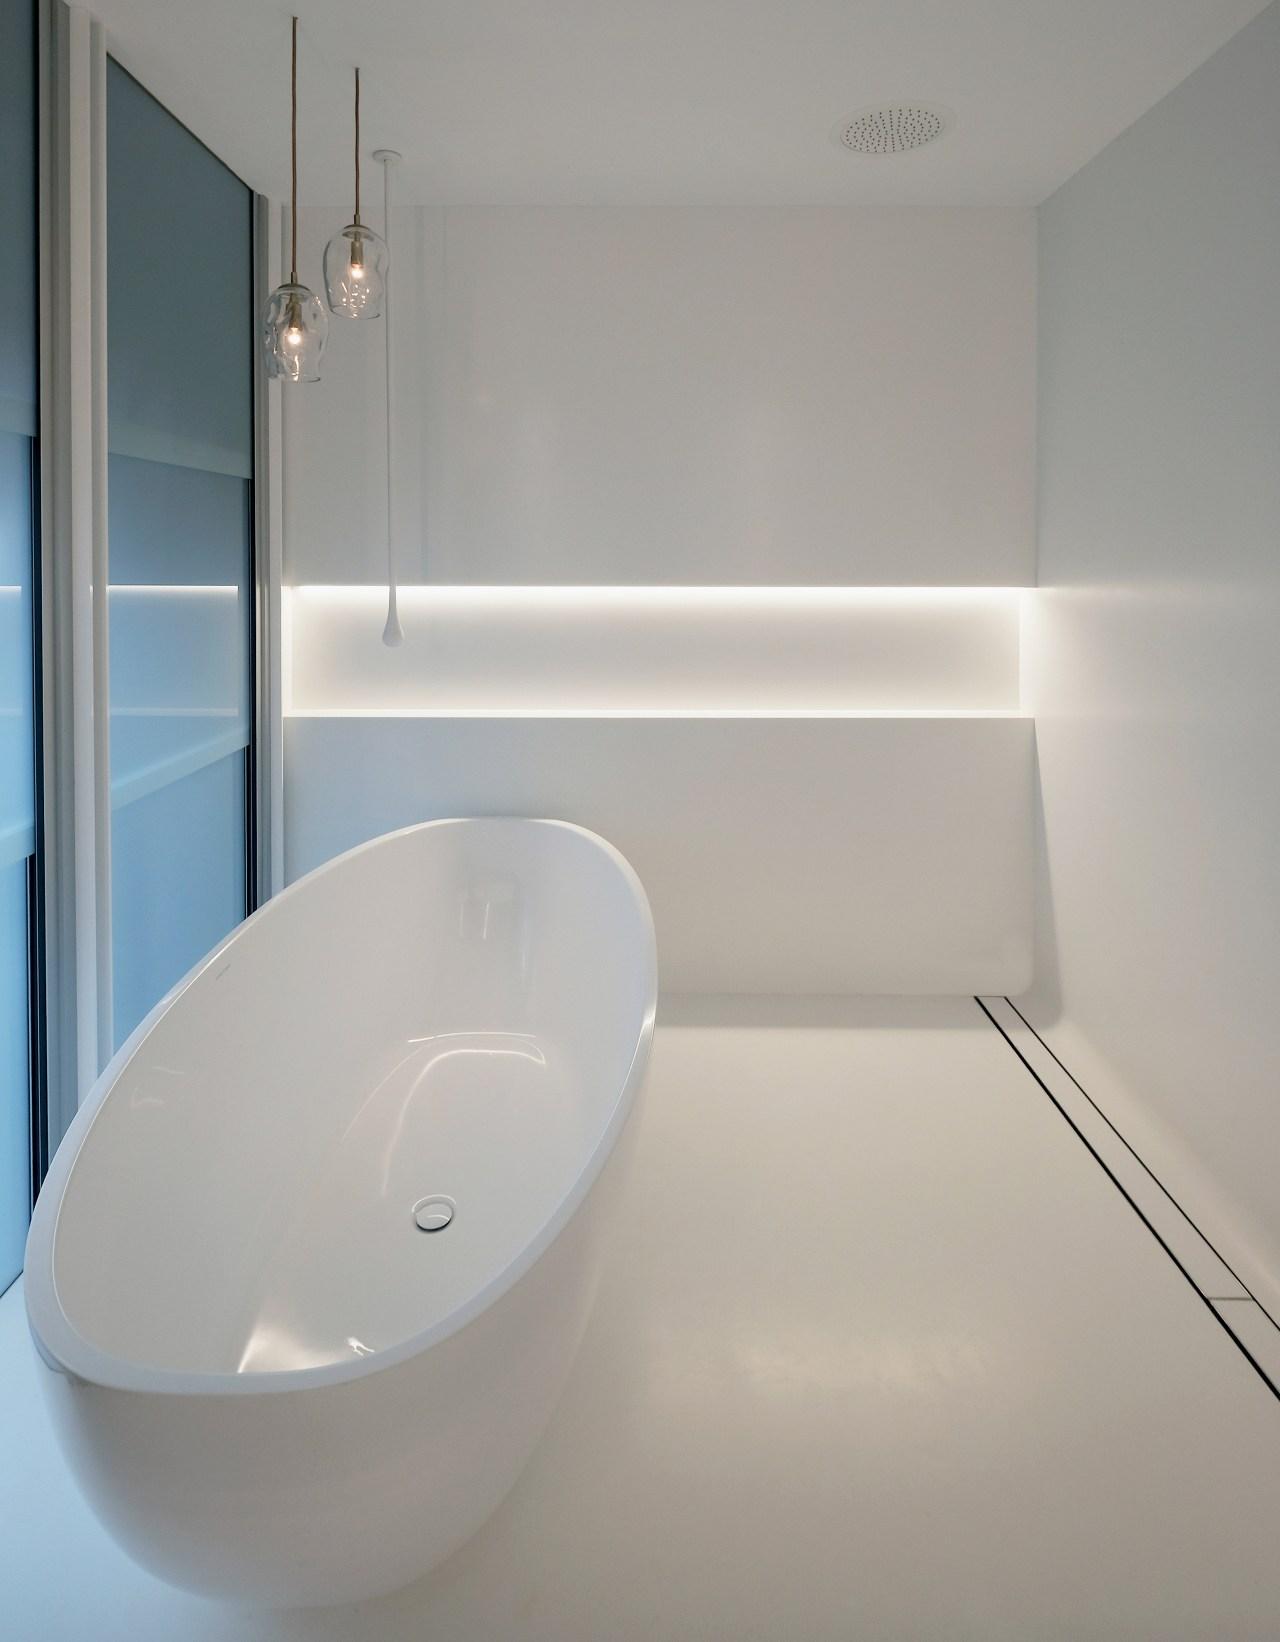 Coloured glass frameless sash windows open this bathroom architecture, bathroom, bathtub, ceramic, floor, flooring, glass, house, interior design, material property, plumbing fixture, property, room, tap, tile, toilet, wall, gray